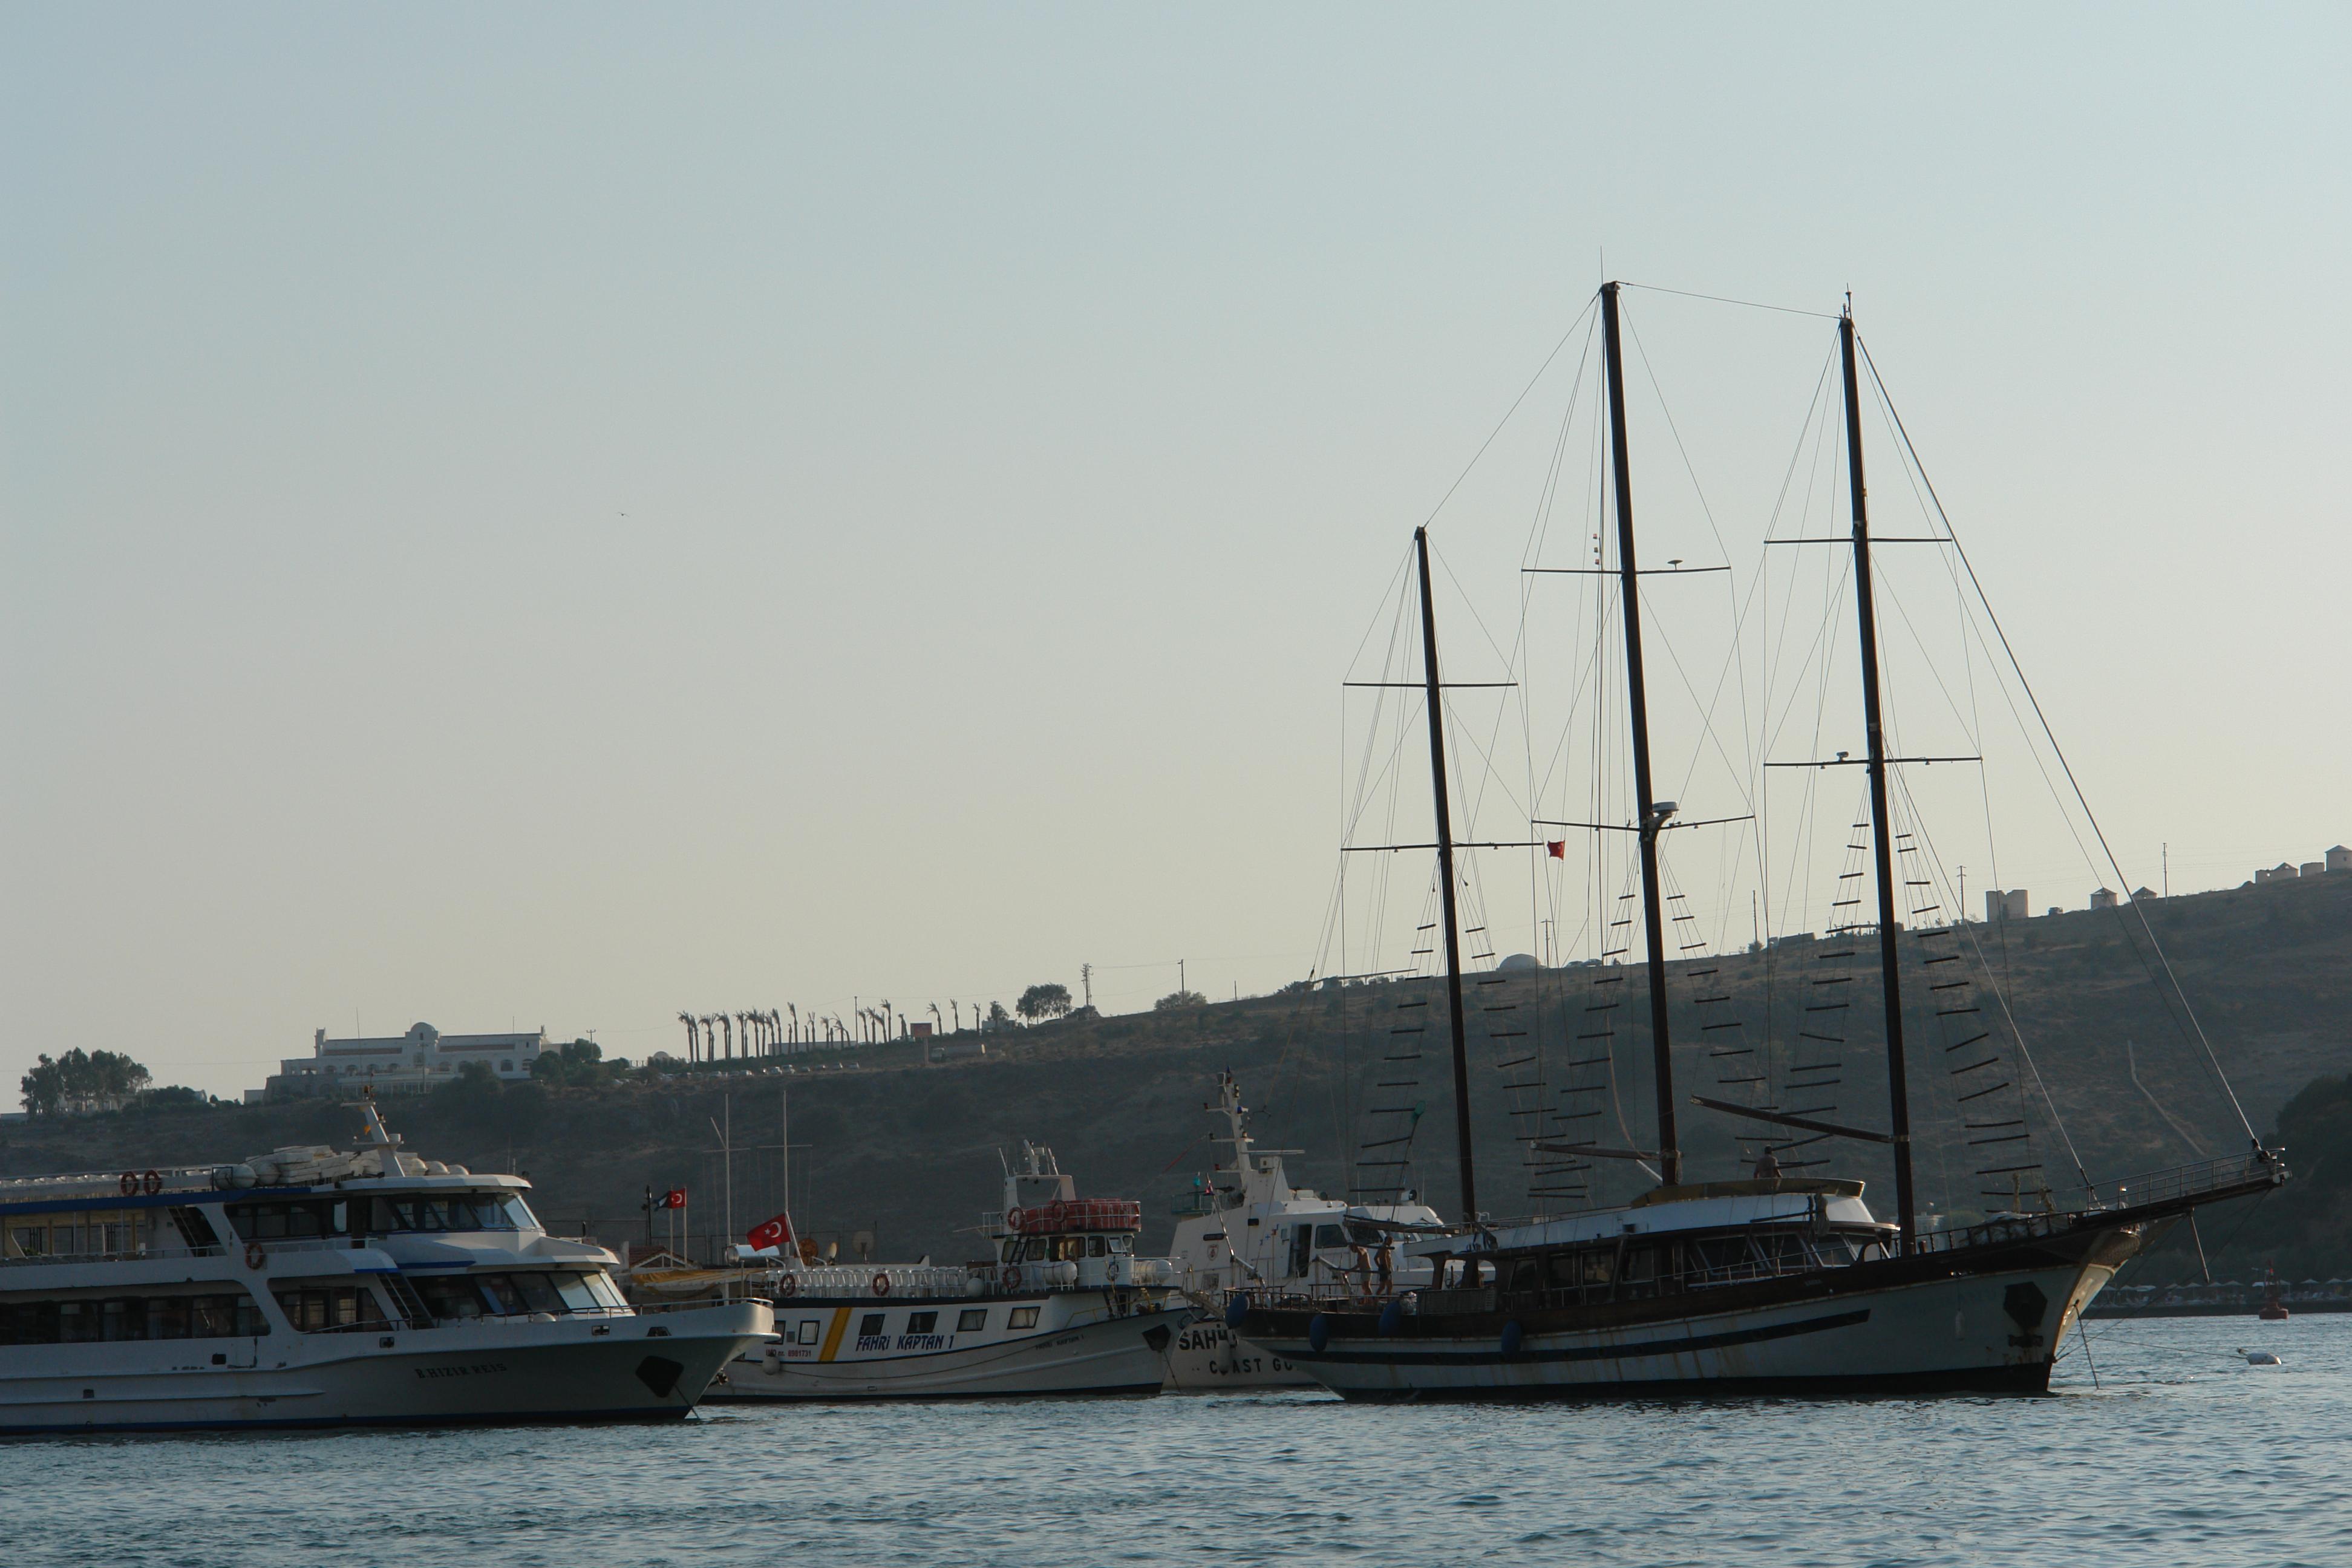 Boats, Cost, Ferry, Mast, Ocean, HQ Photo